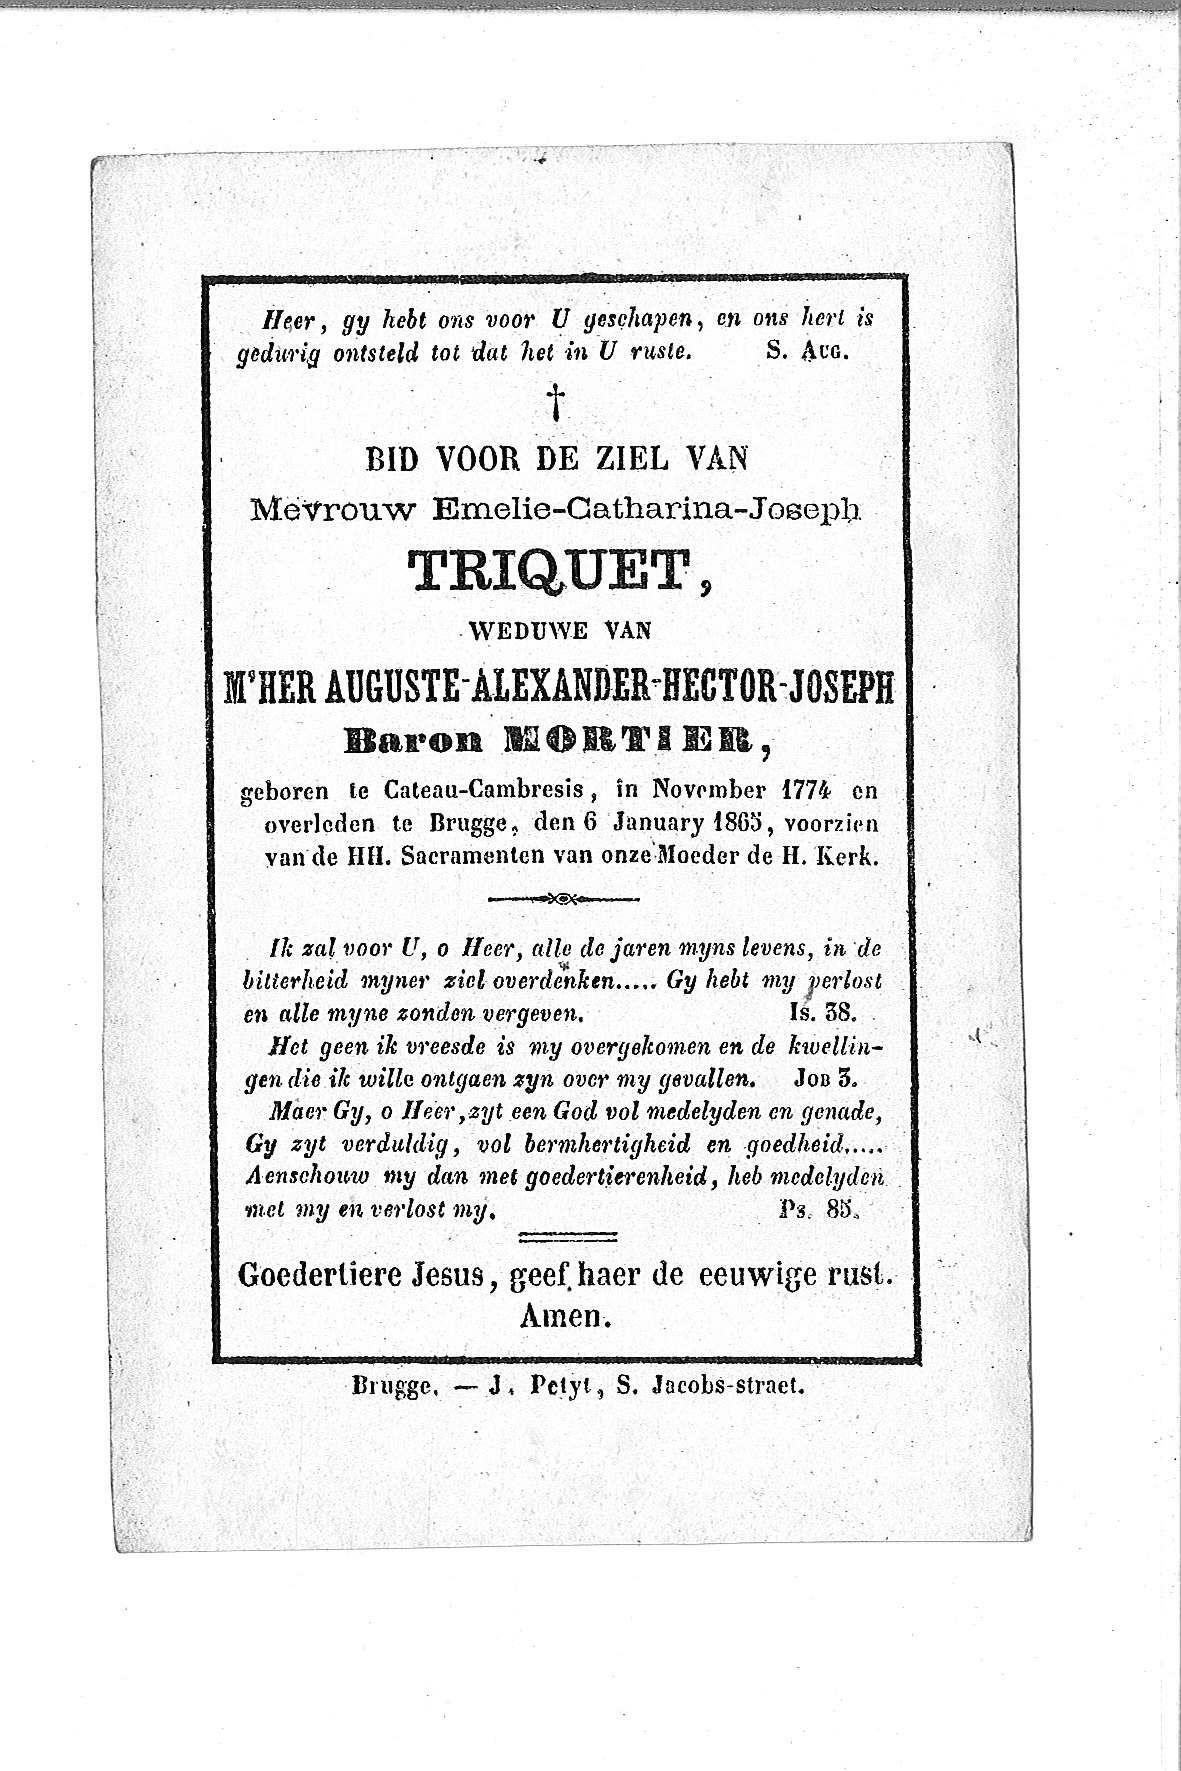 Emilie-Catharina-Joseph(1865)20120621134457_00123.jpg